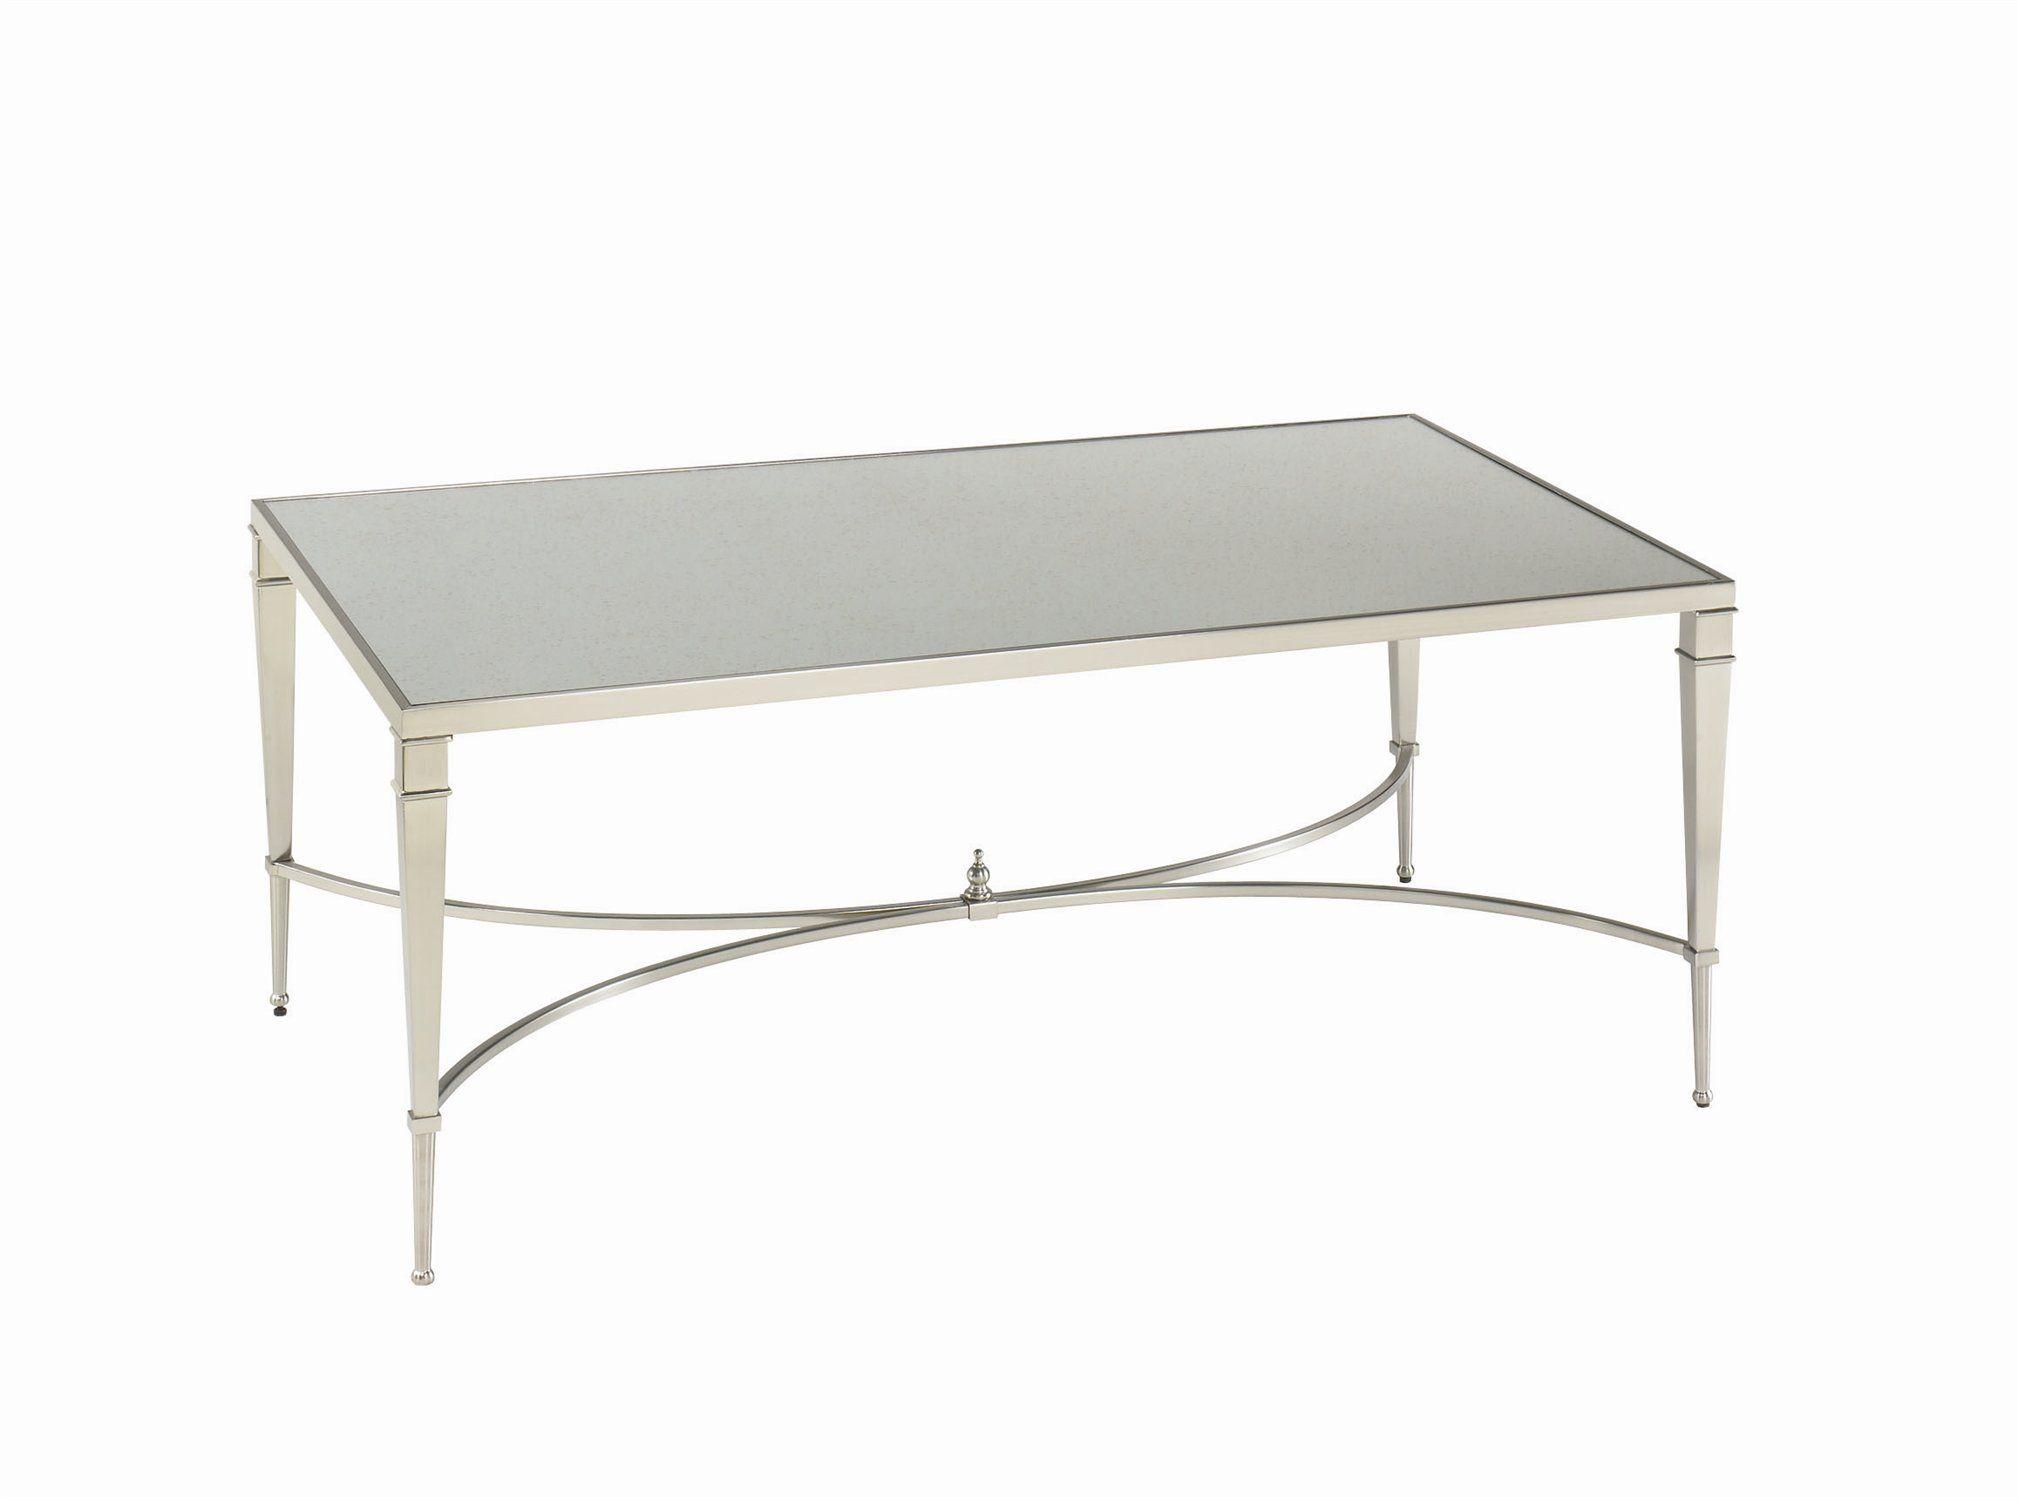 Hammary mallory x rectangular coffee table decor